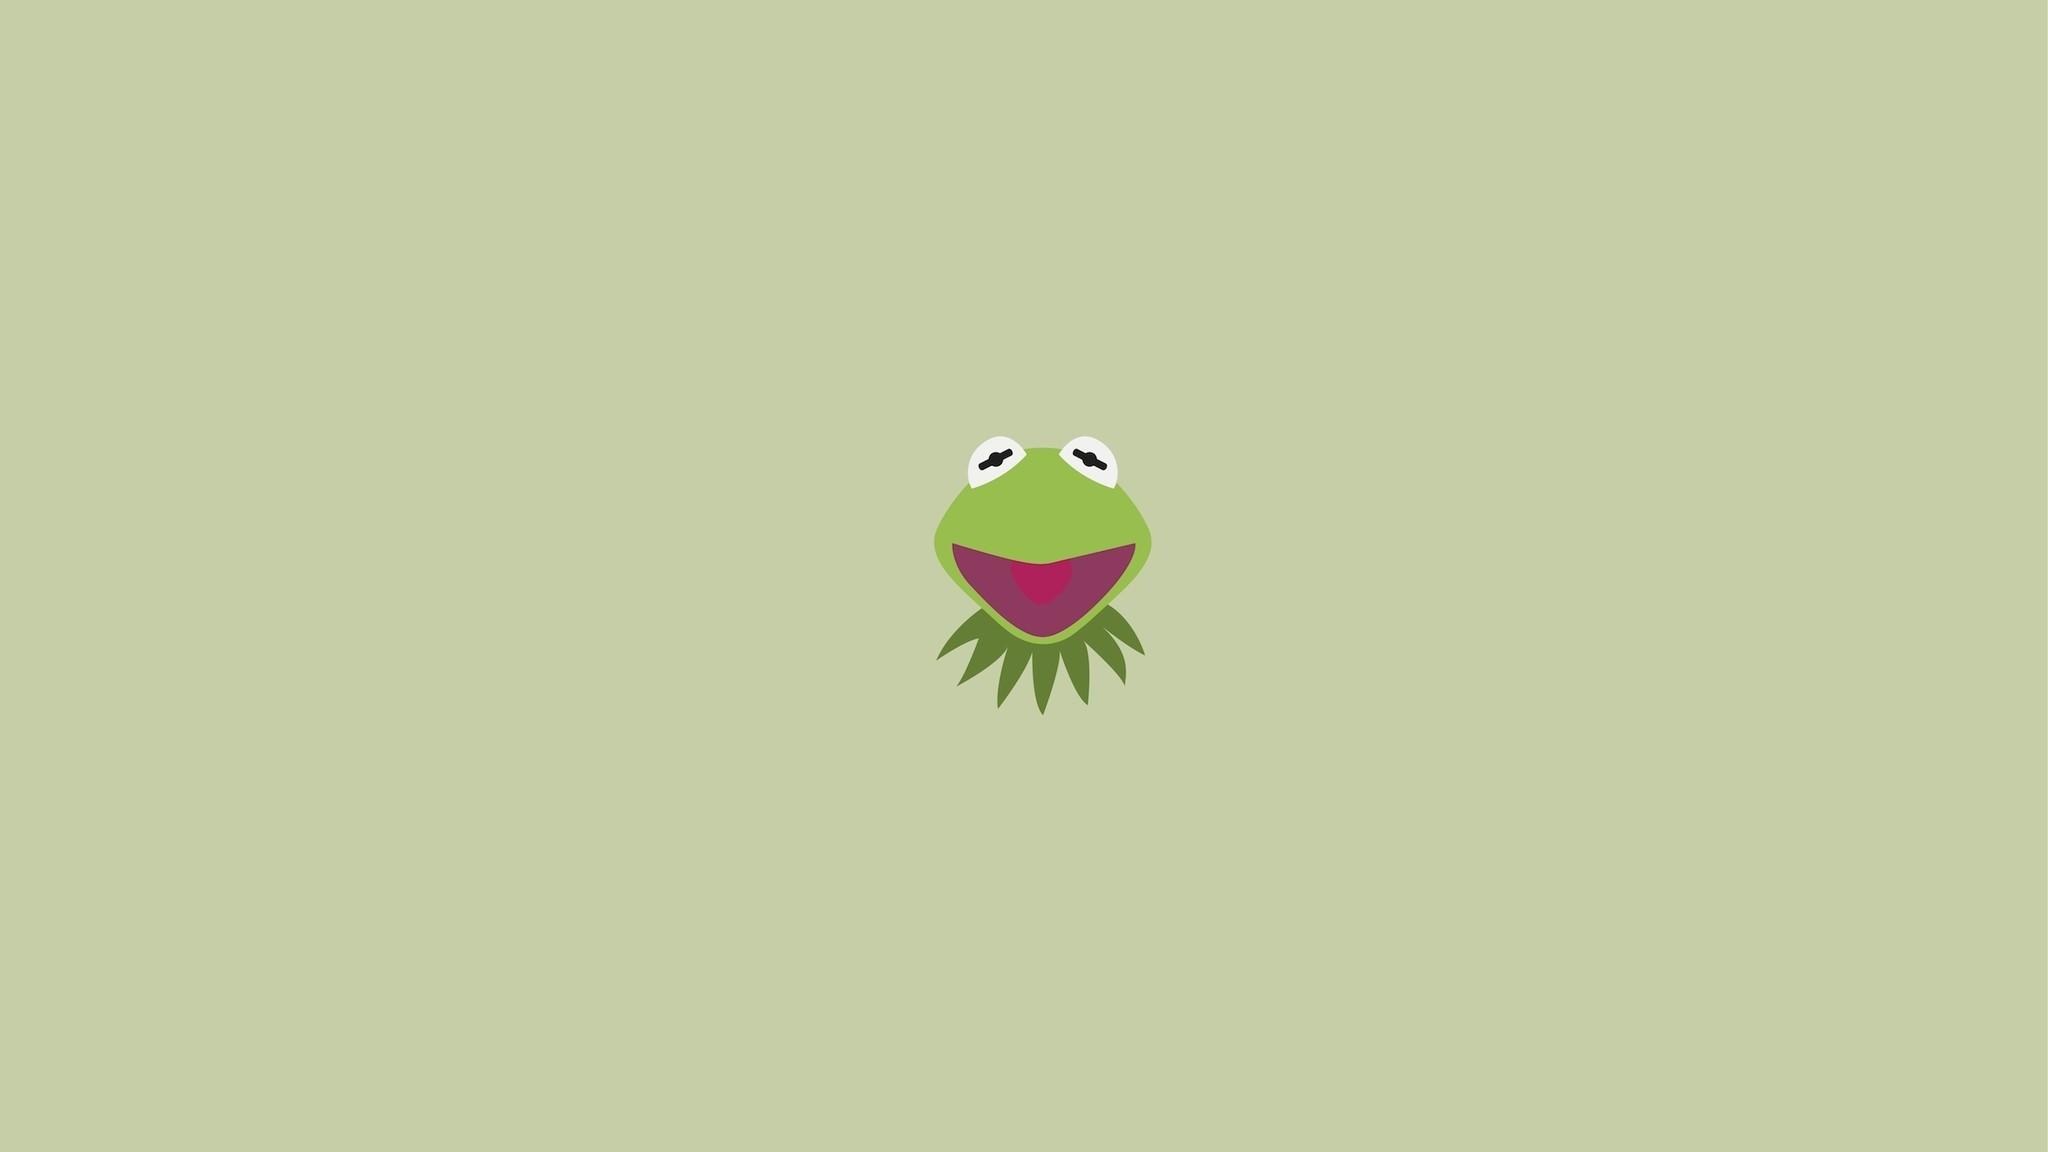 Description: Download Minimalistic kermit the frog artwork 2 wallpaper/desktop  background in HD & Widescreen resolution.